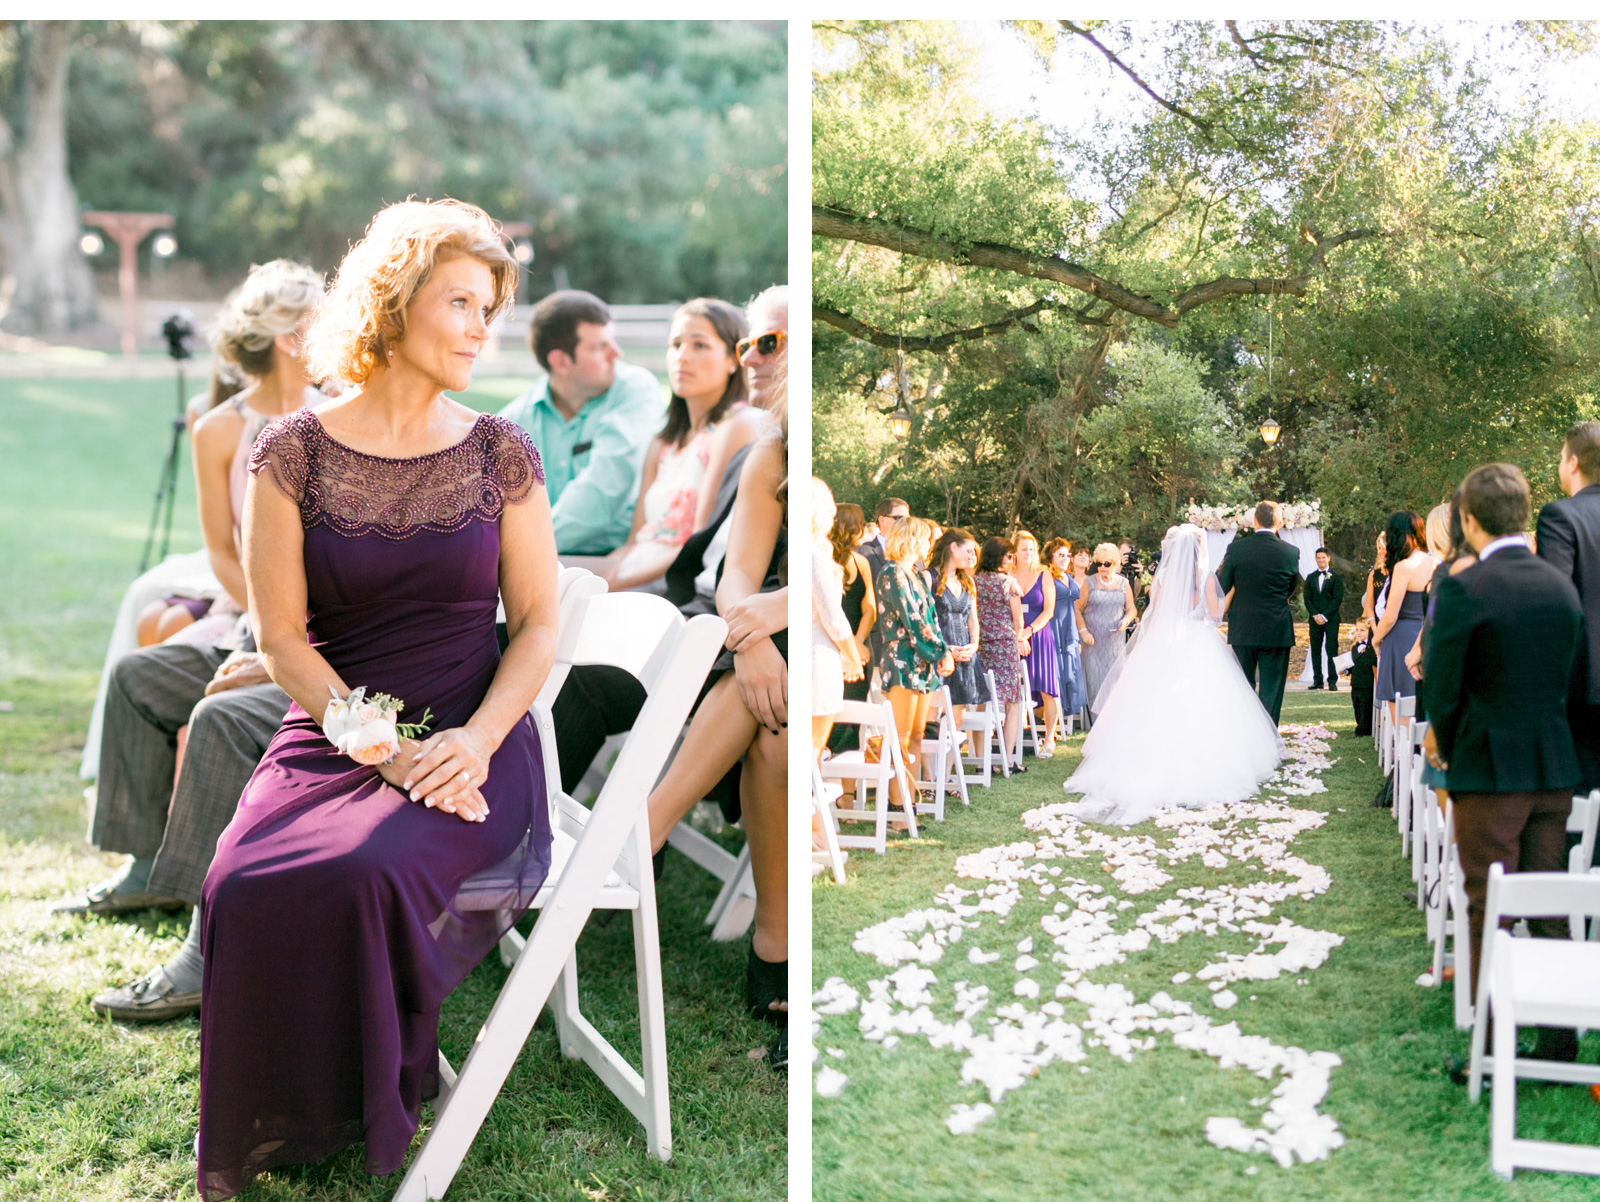 Nia-Booko-Miss-USA-Wedding_07.jpg